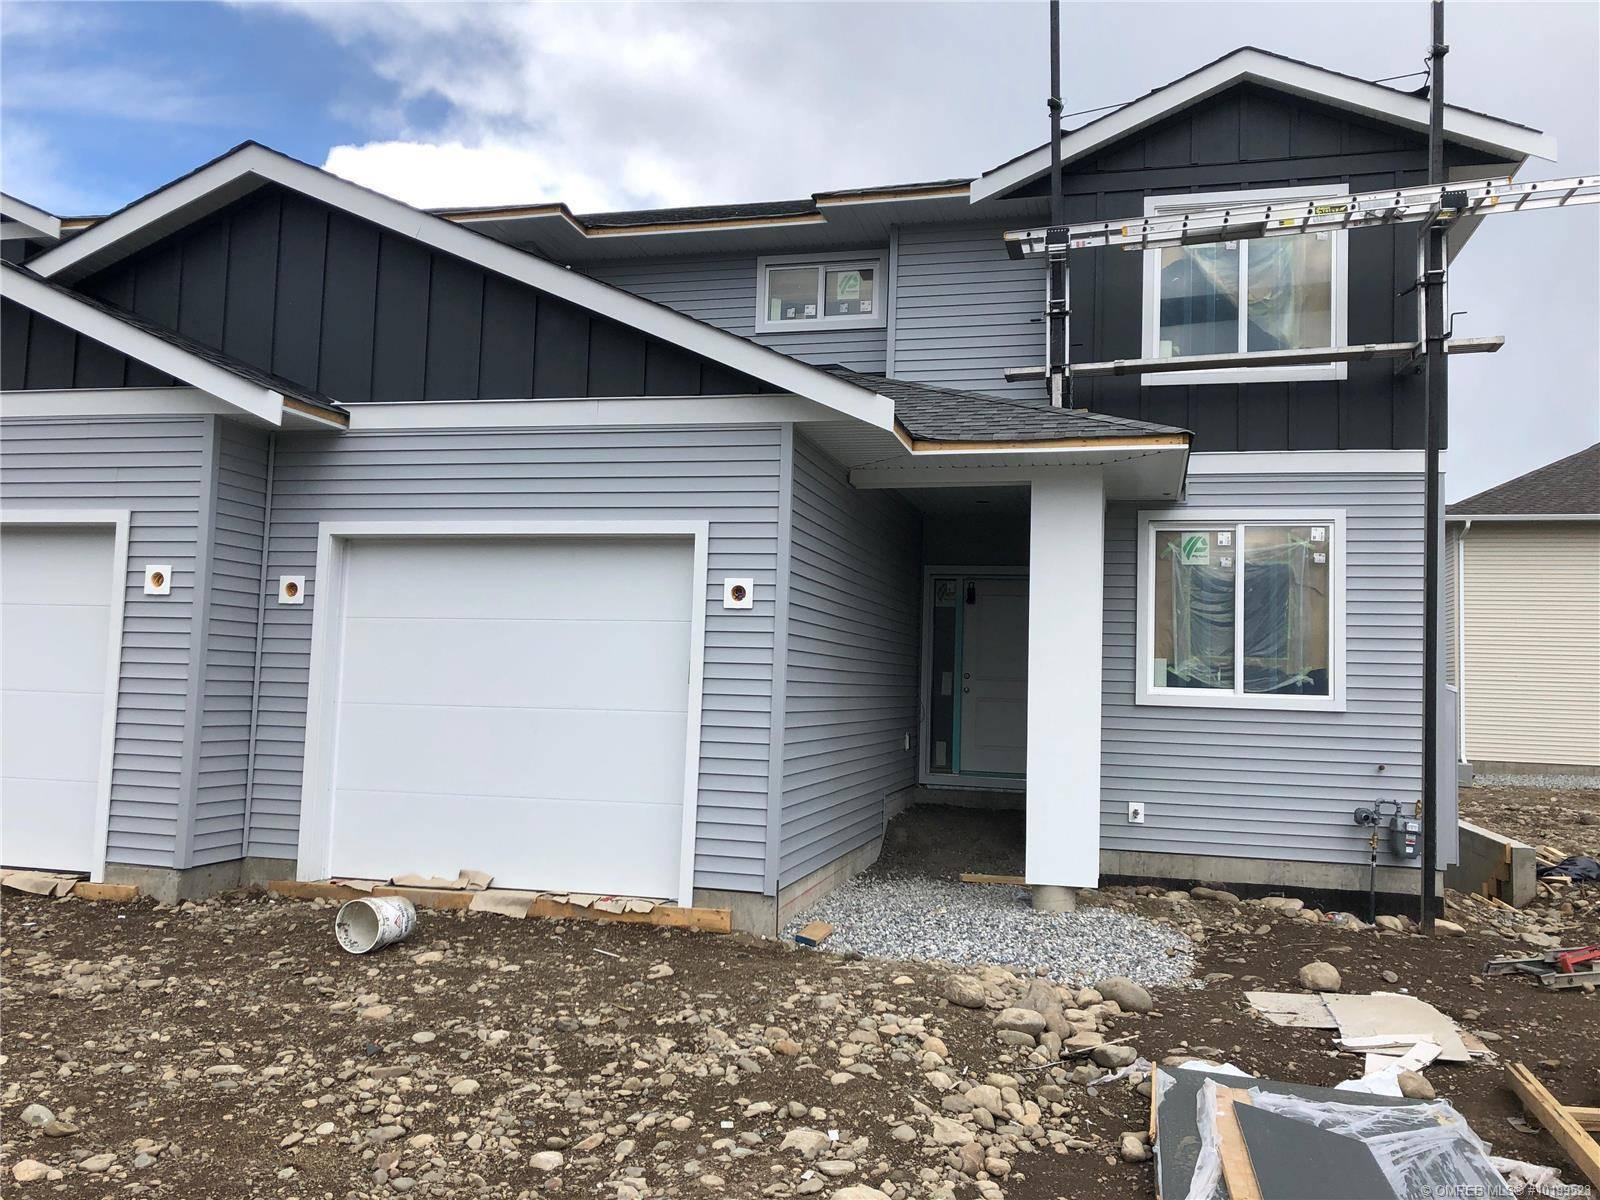 Townhouse for sale at 490 Sugars Ave Kelowna British Columbia - MLS: 10199523